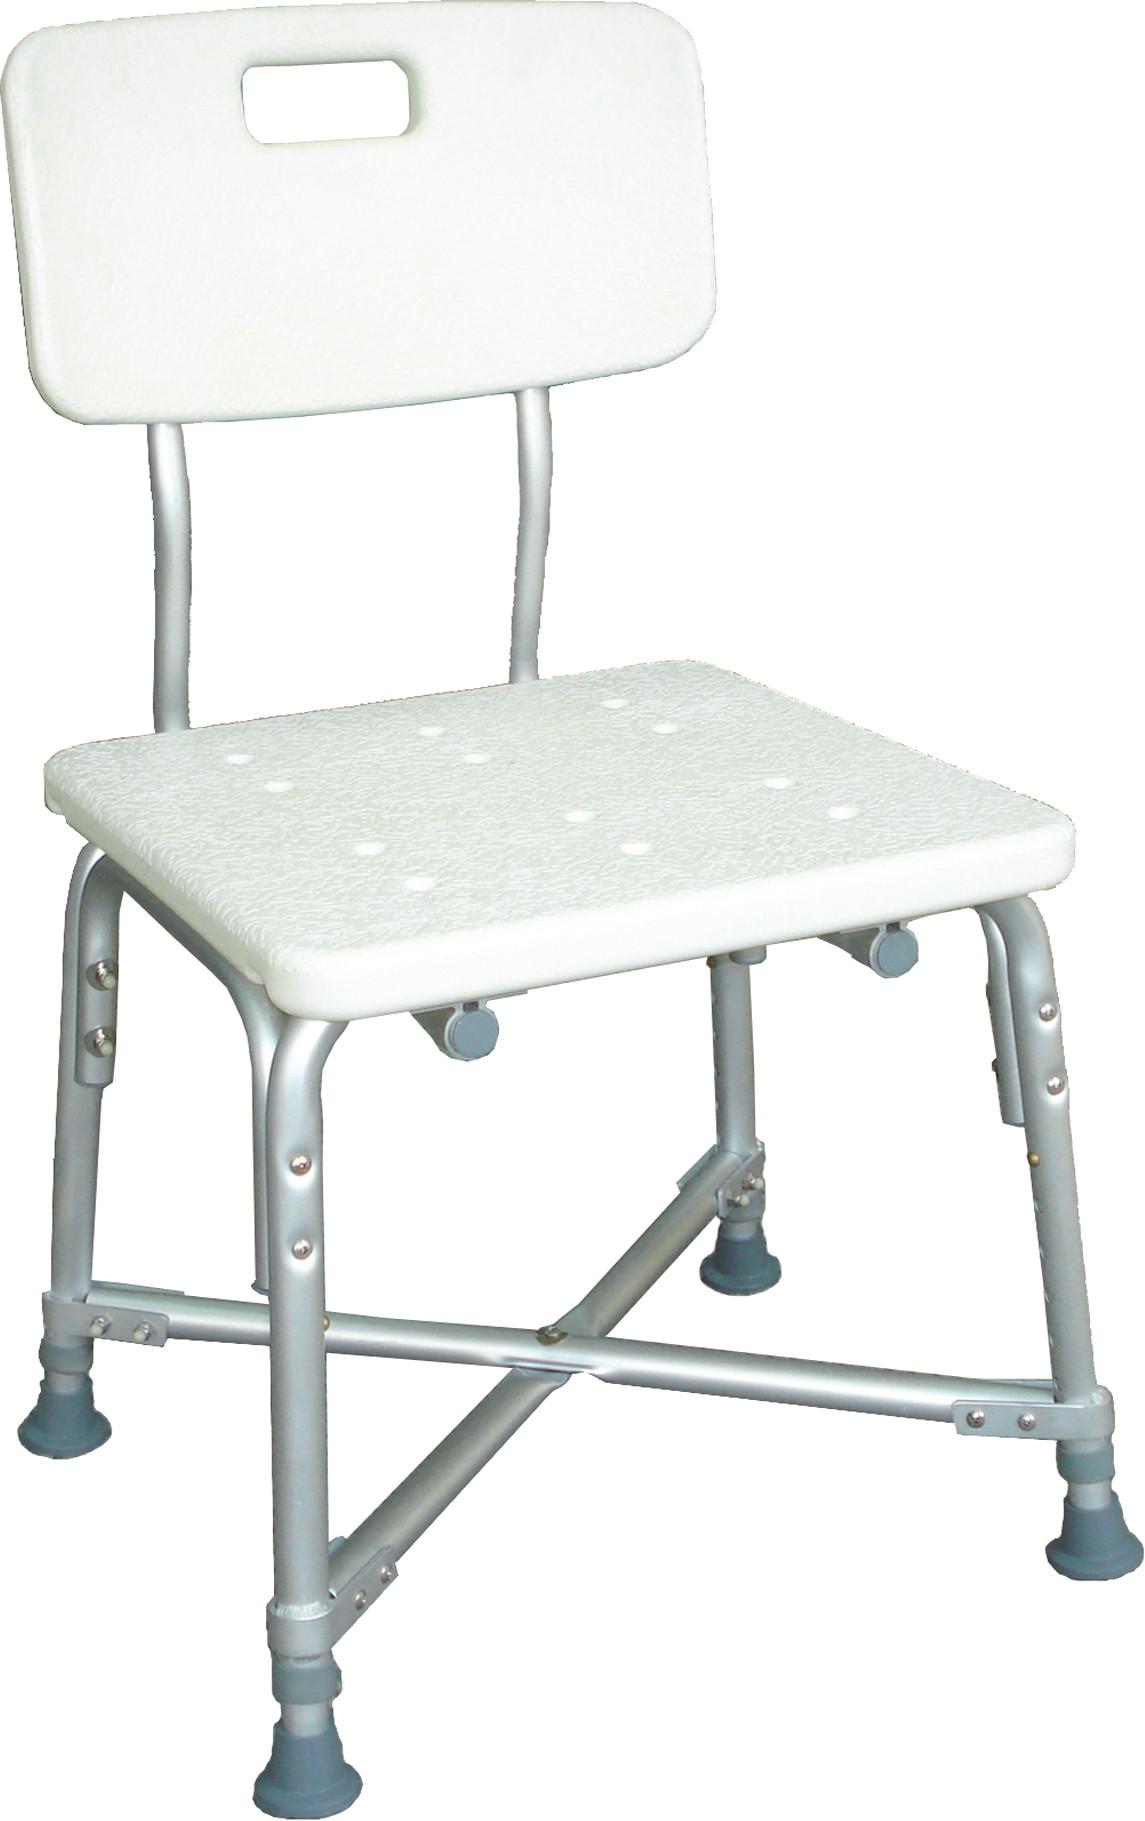 Living well hme bath shower seats heavy duty bariatric bath bench Bath bench